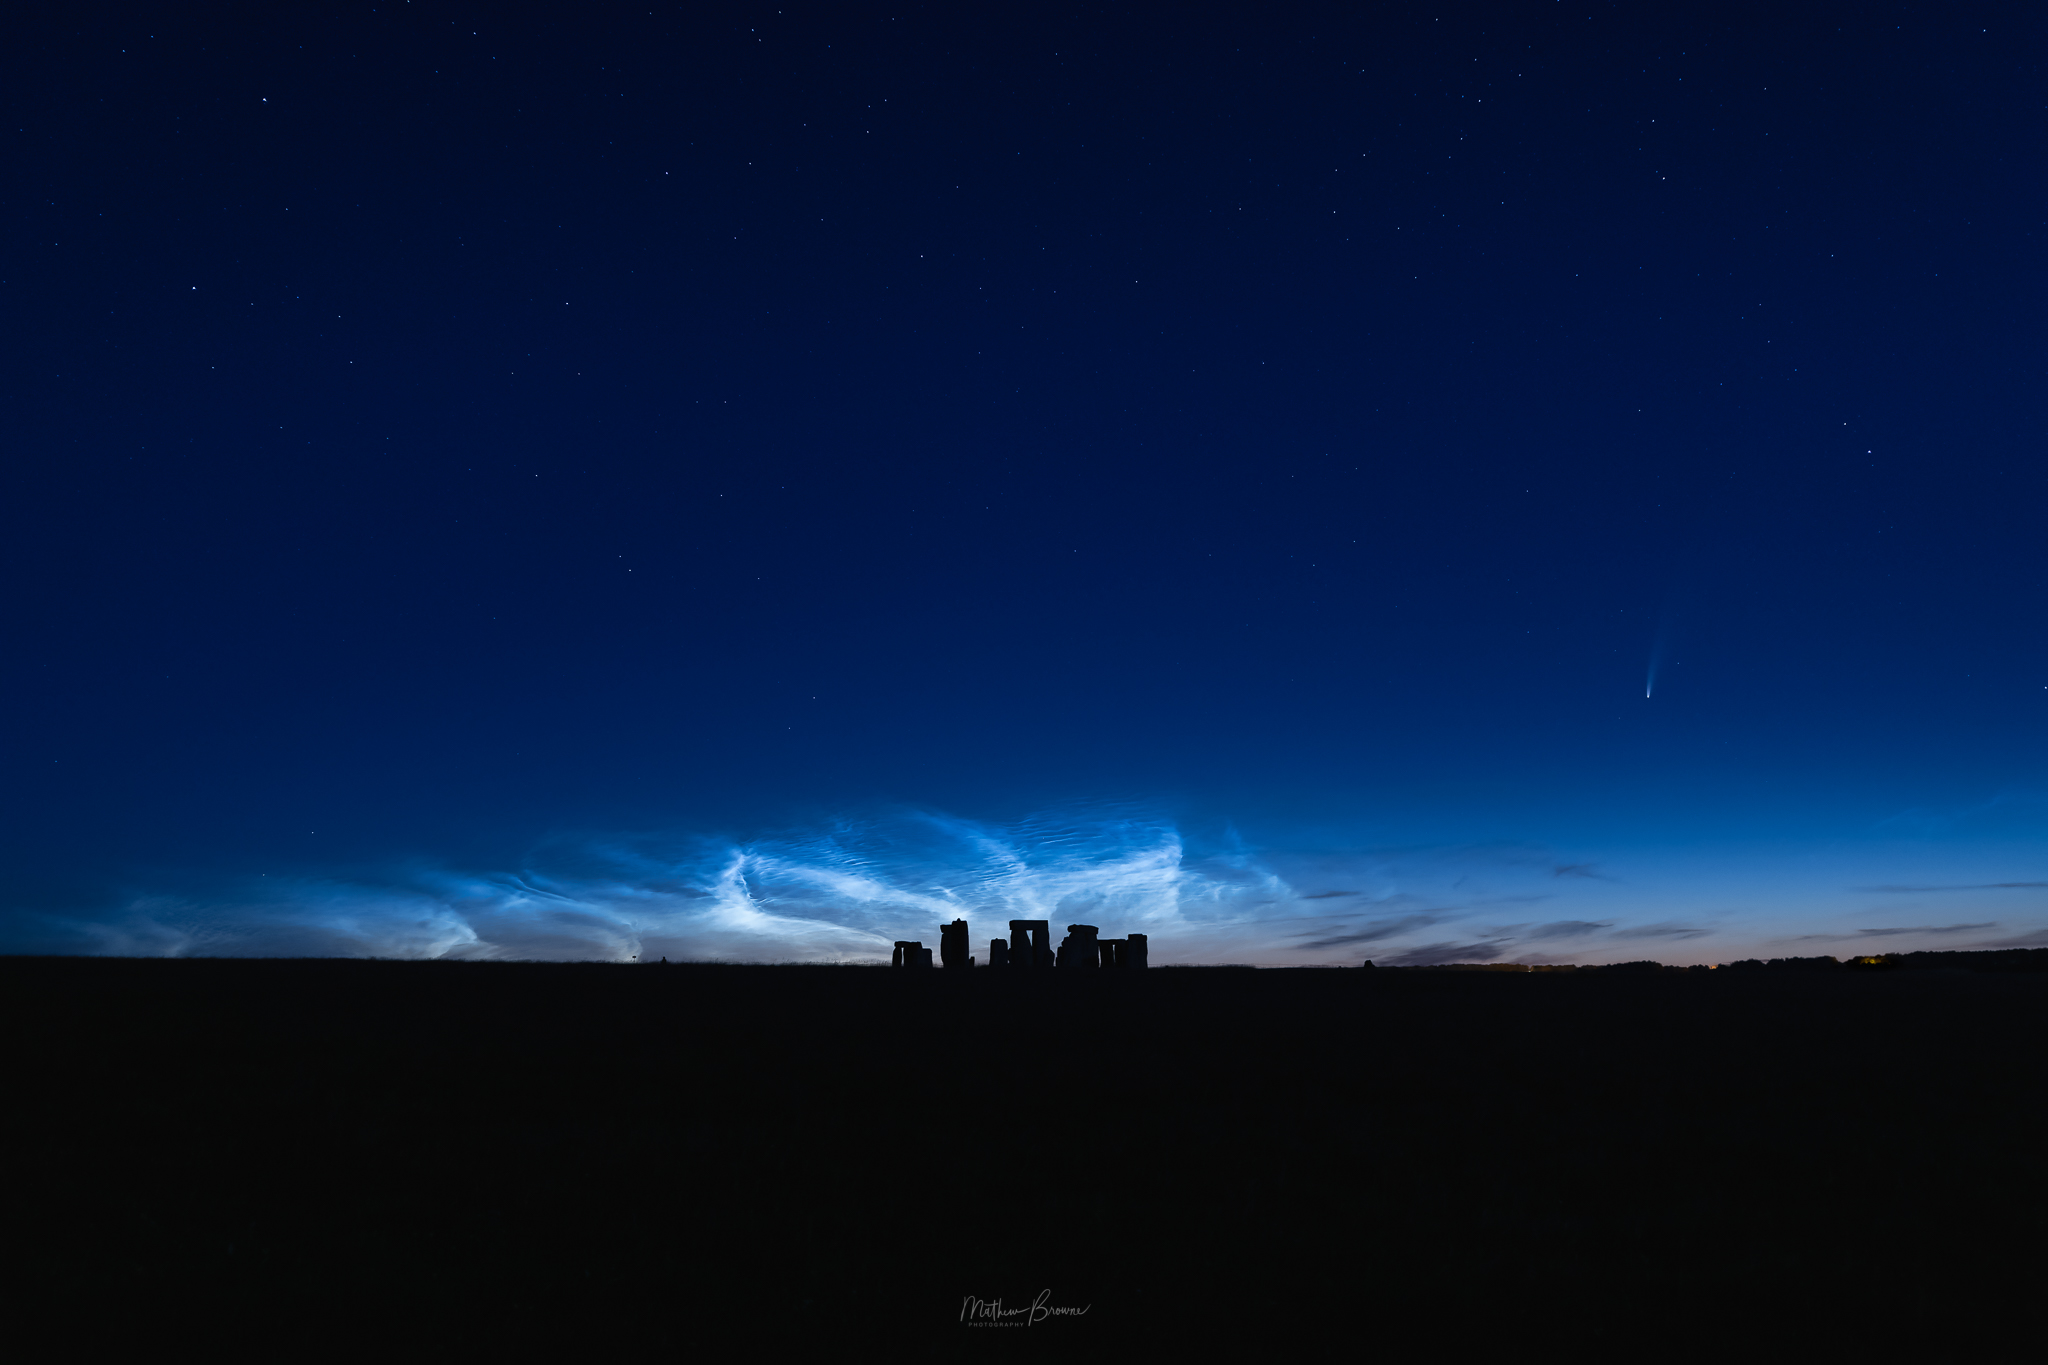 Stonehenge with comet NEOWISE